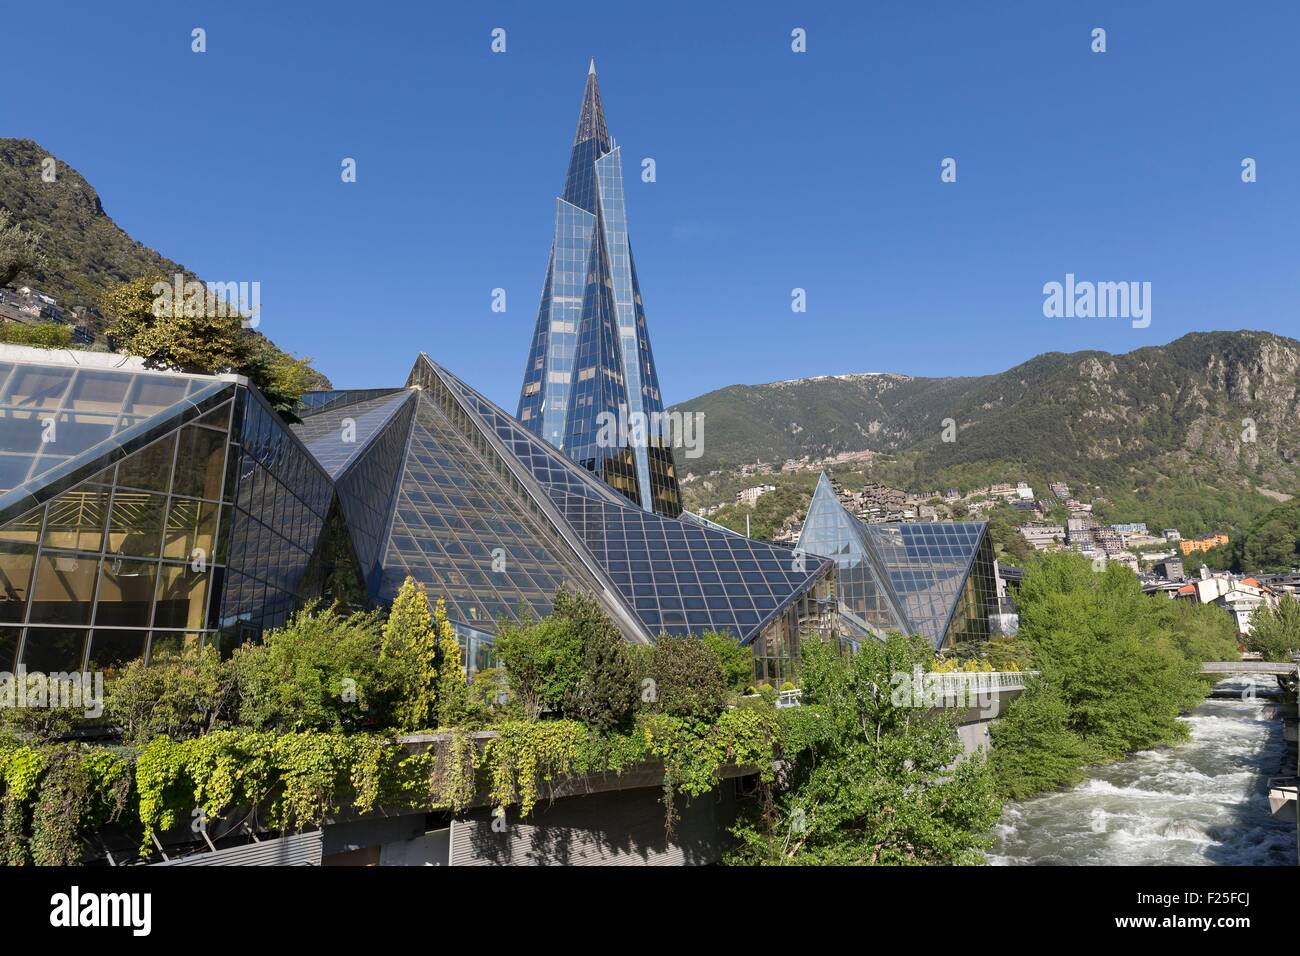 Andorra, Andorra La Vella, capital city of Andorra state, Escaldes Engordany, Caldea thermal spa and wellness resort - Stock Image